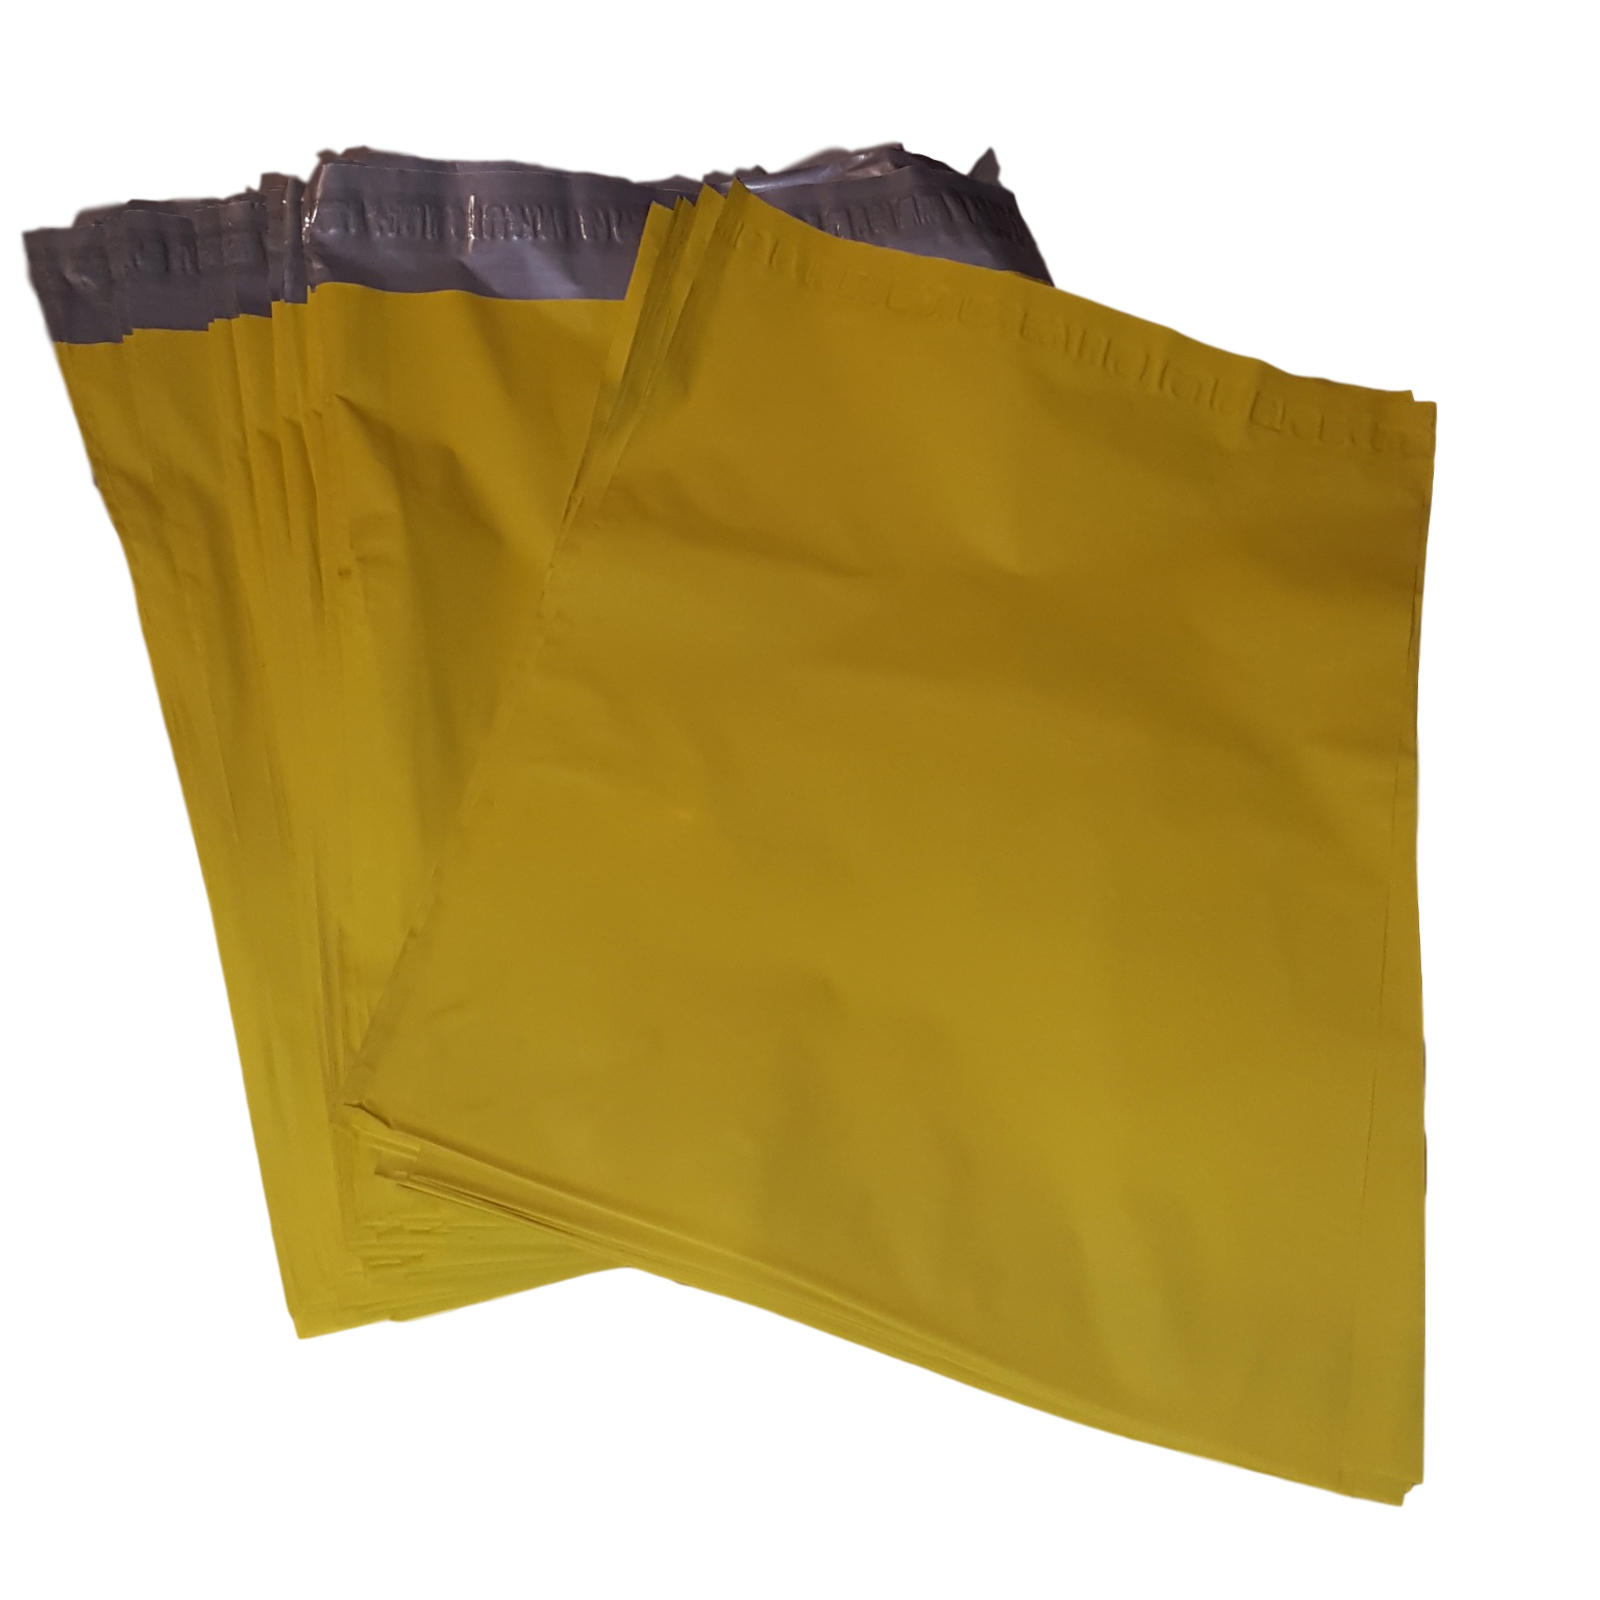 Plastic Shipping Bag Envelopes Polybag Polymailer Zoom